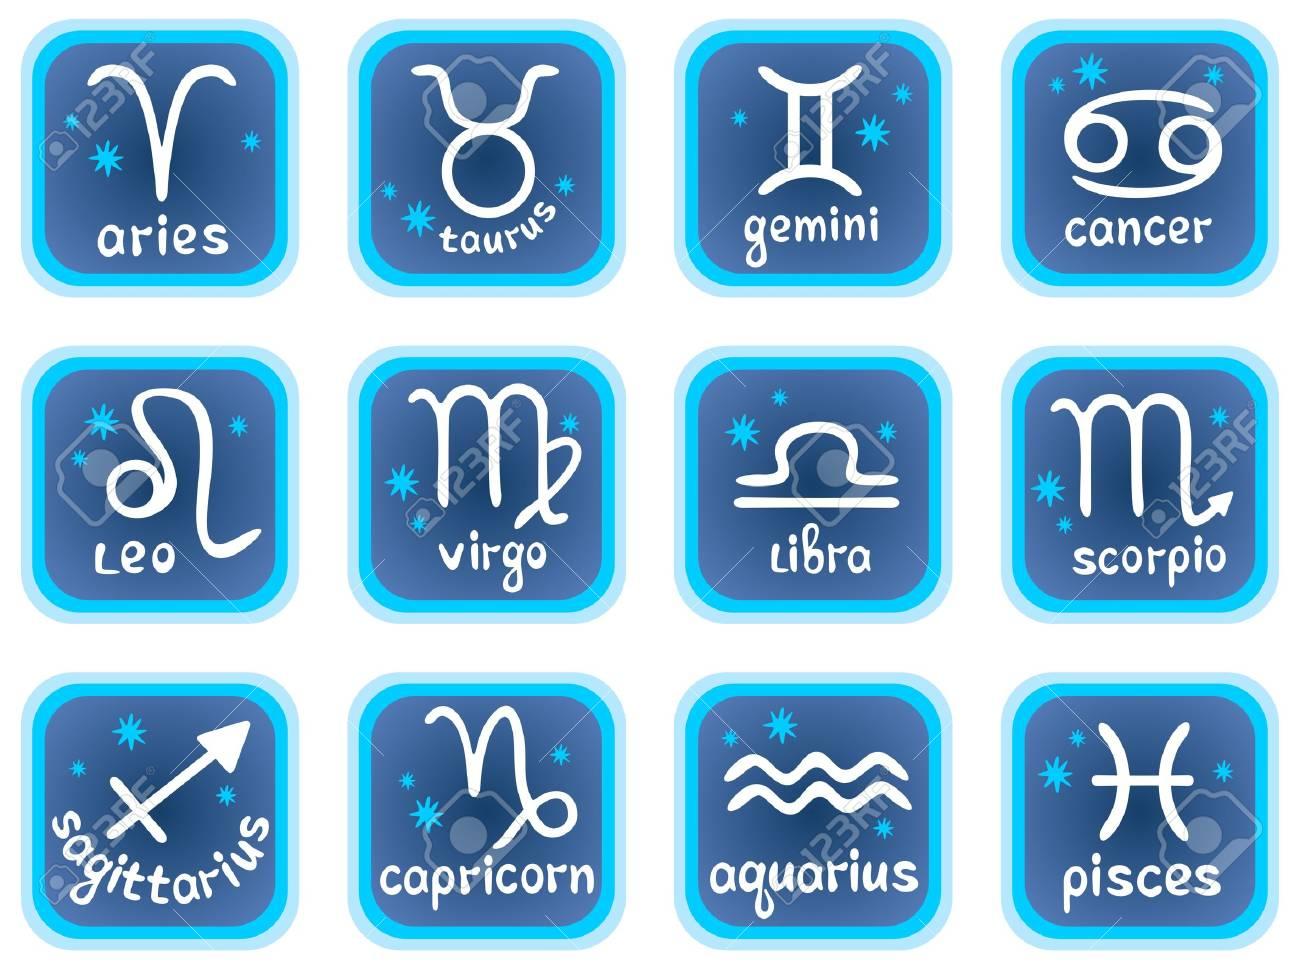 White stylized horoscope symbols on a blue background. Zodiac star signs. Stock Vector - 3974177